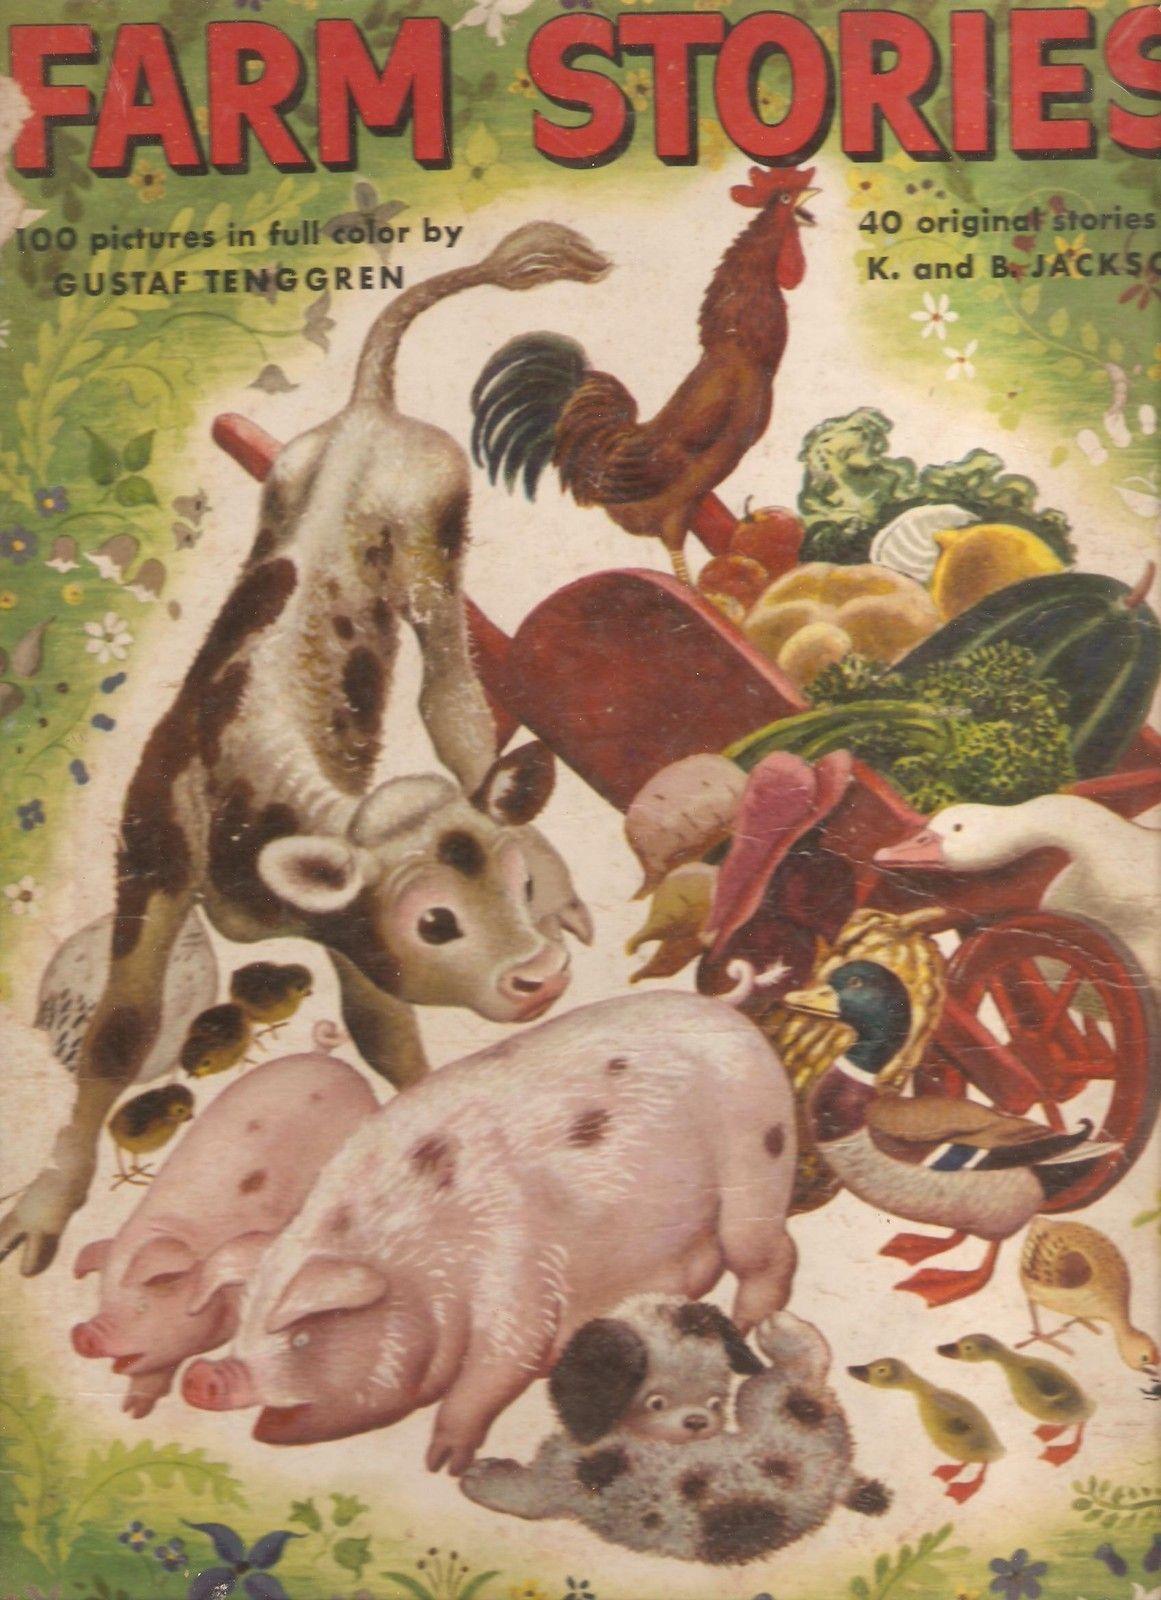 ''Farm Stories'' 1946, illustrated by Gustaf Tenggren   eBay